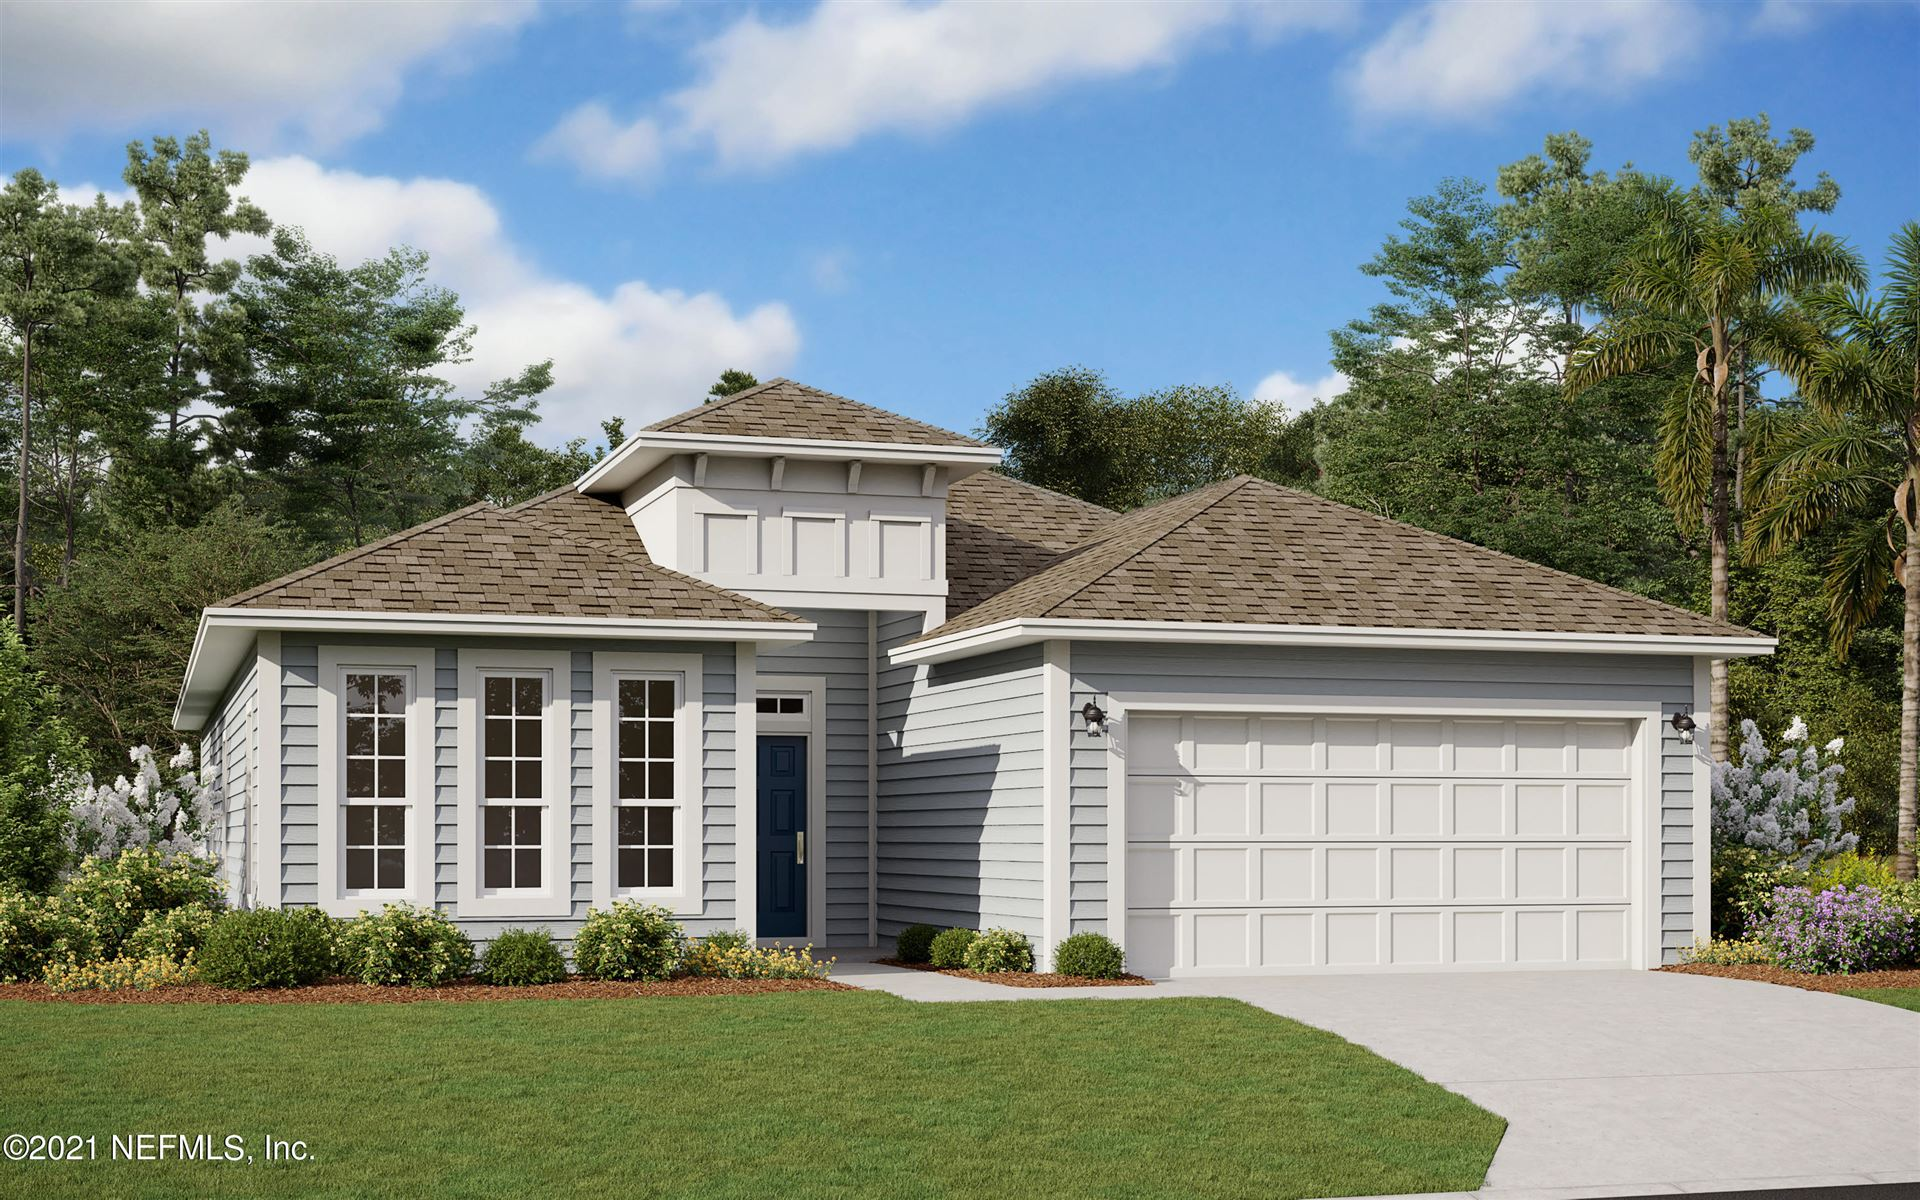 2773 COPPERWOOD AVE #Lot No: 082, Orange Park, FL 32073 - MLS#: 1095384